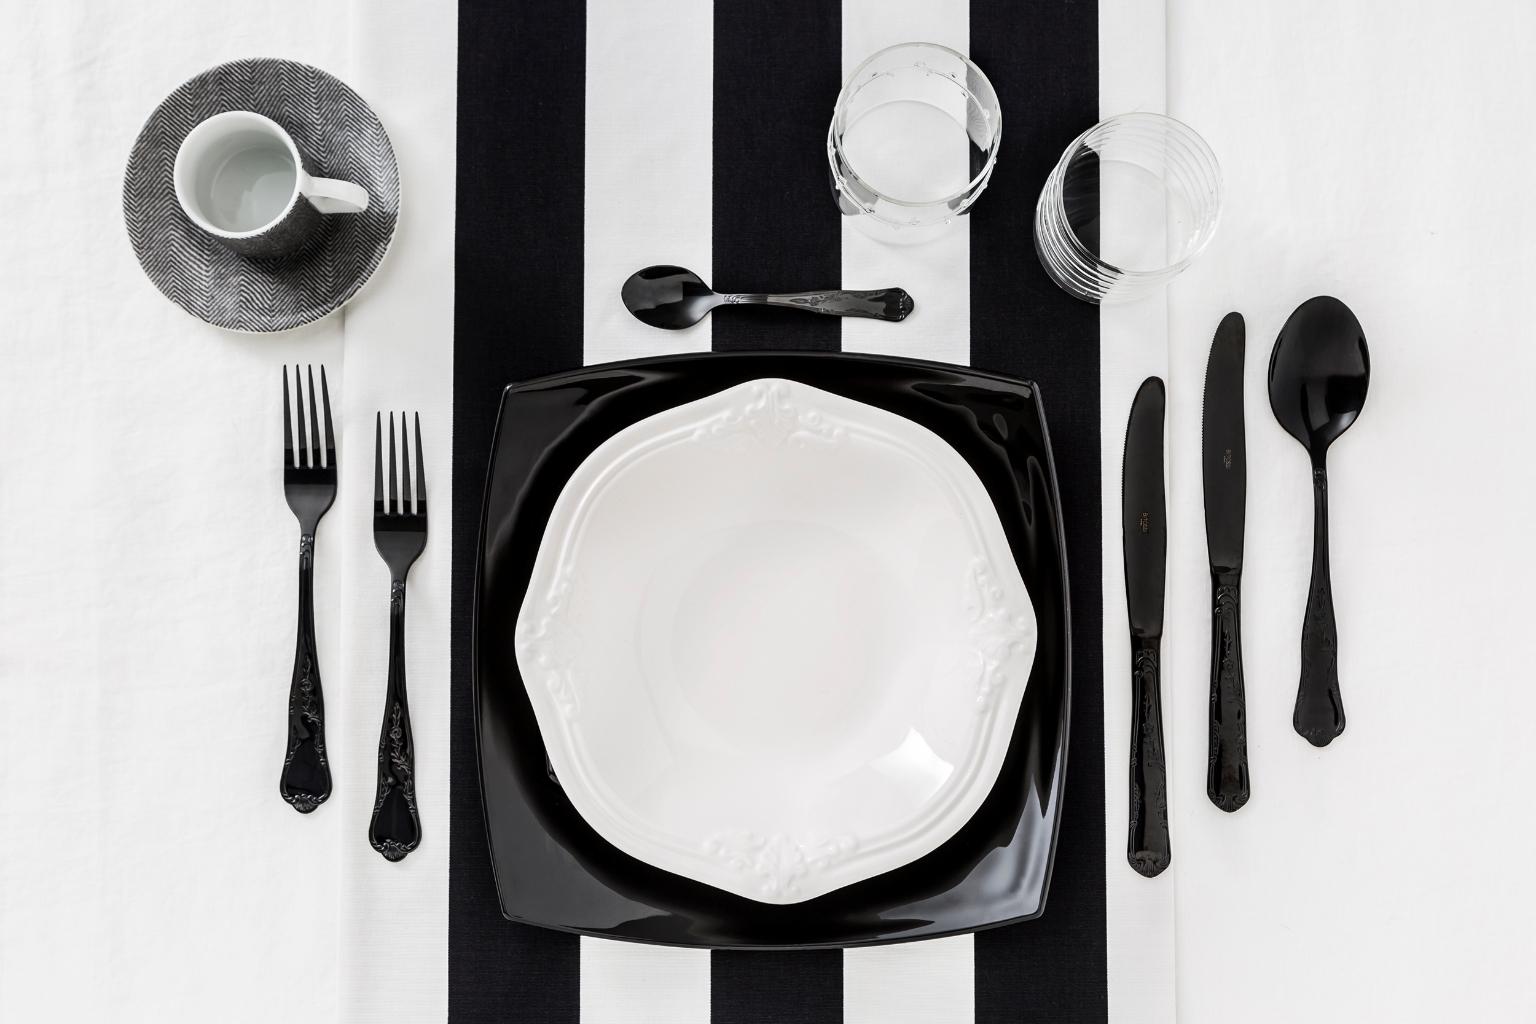 03-Dalani-tavola-Black-and-White-trend-Primavera